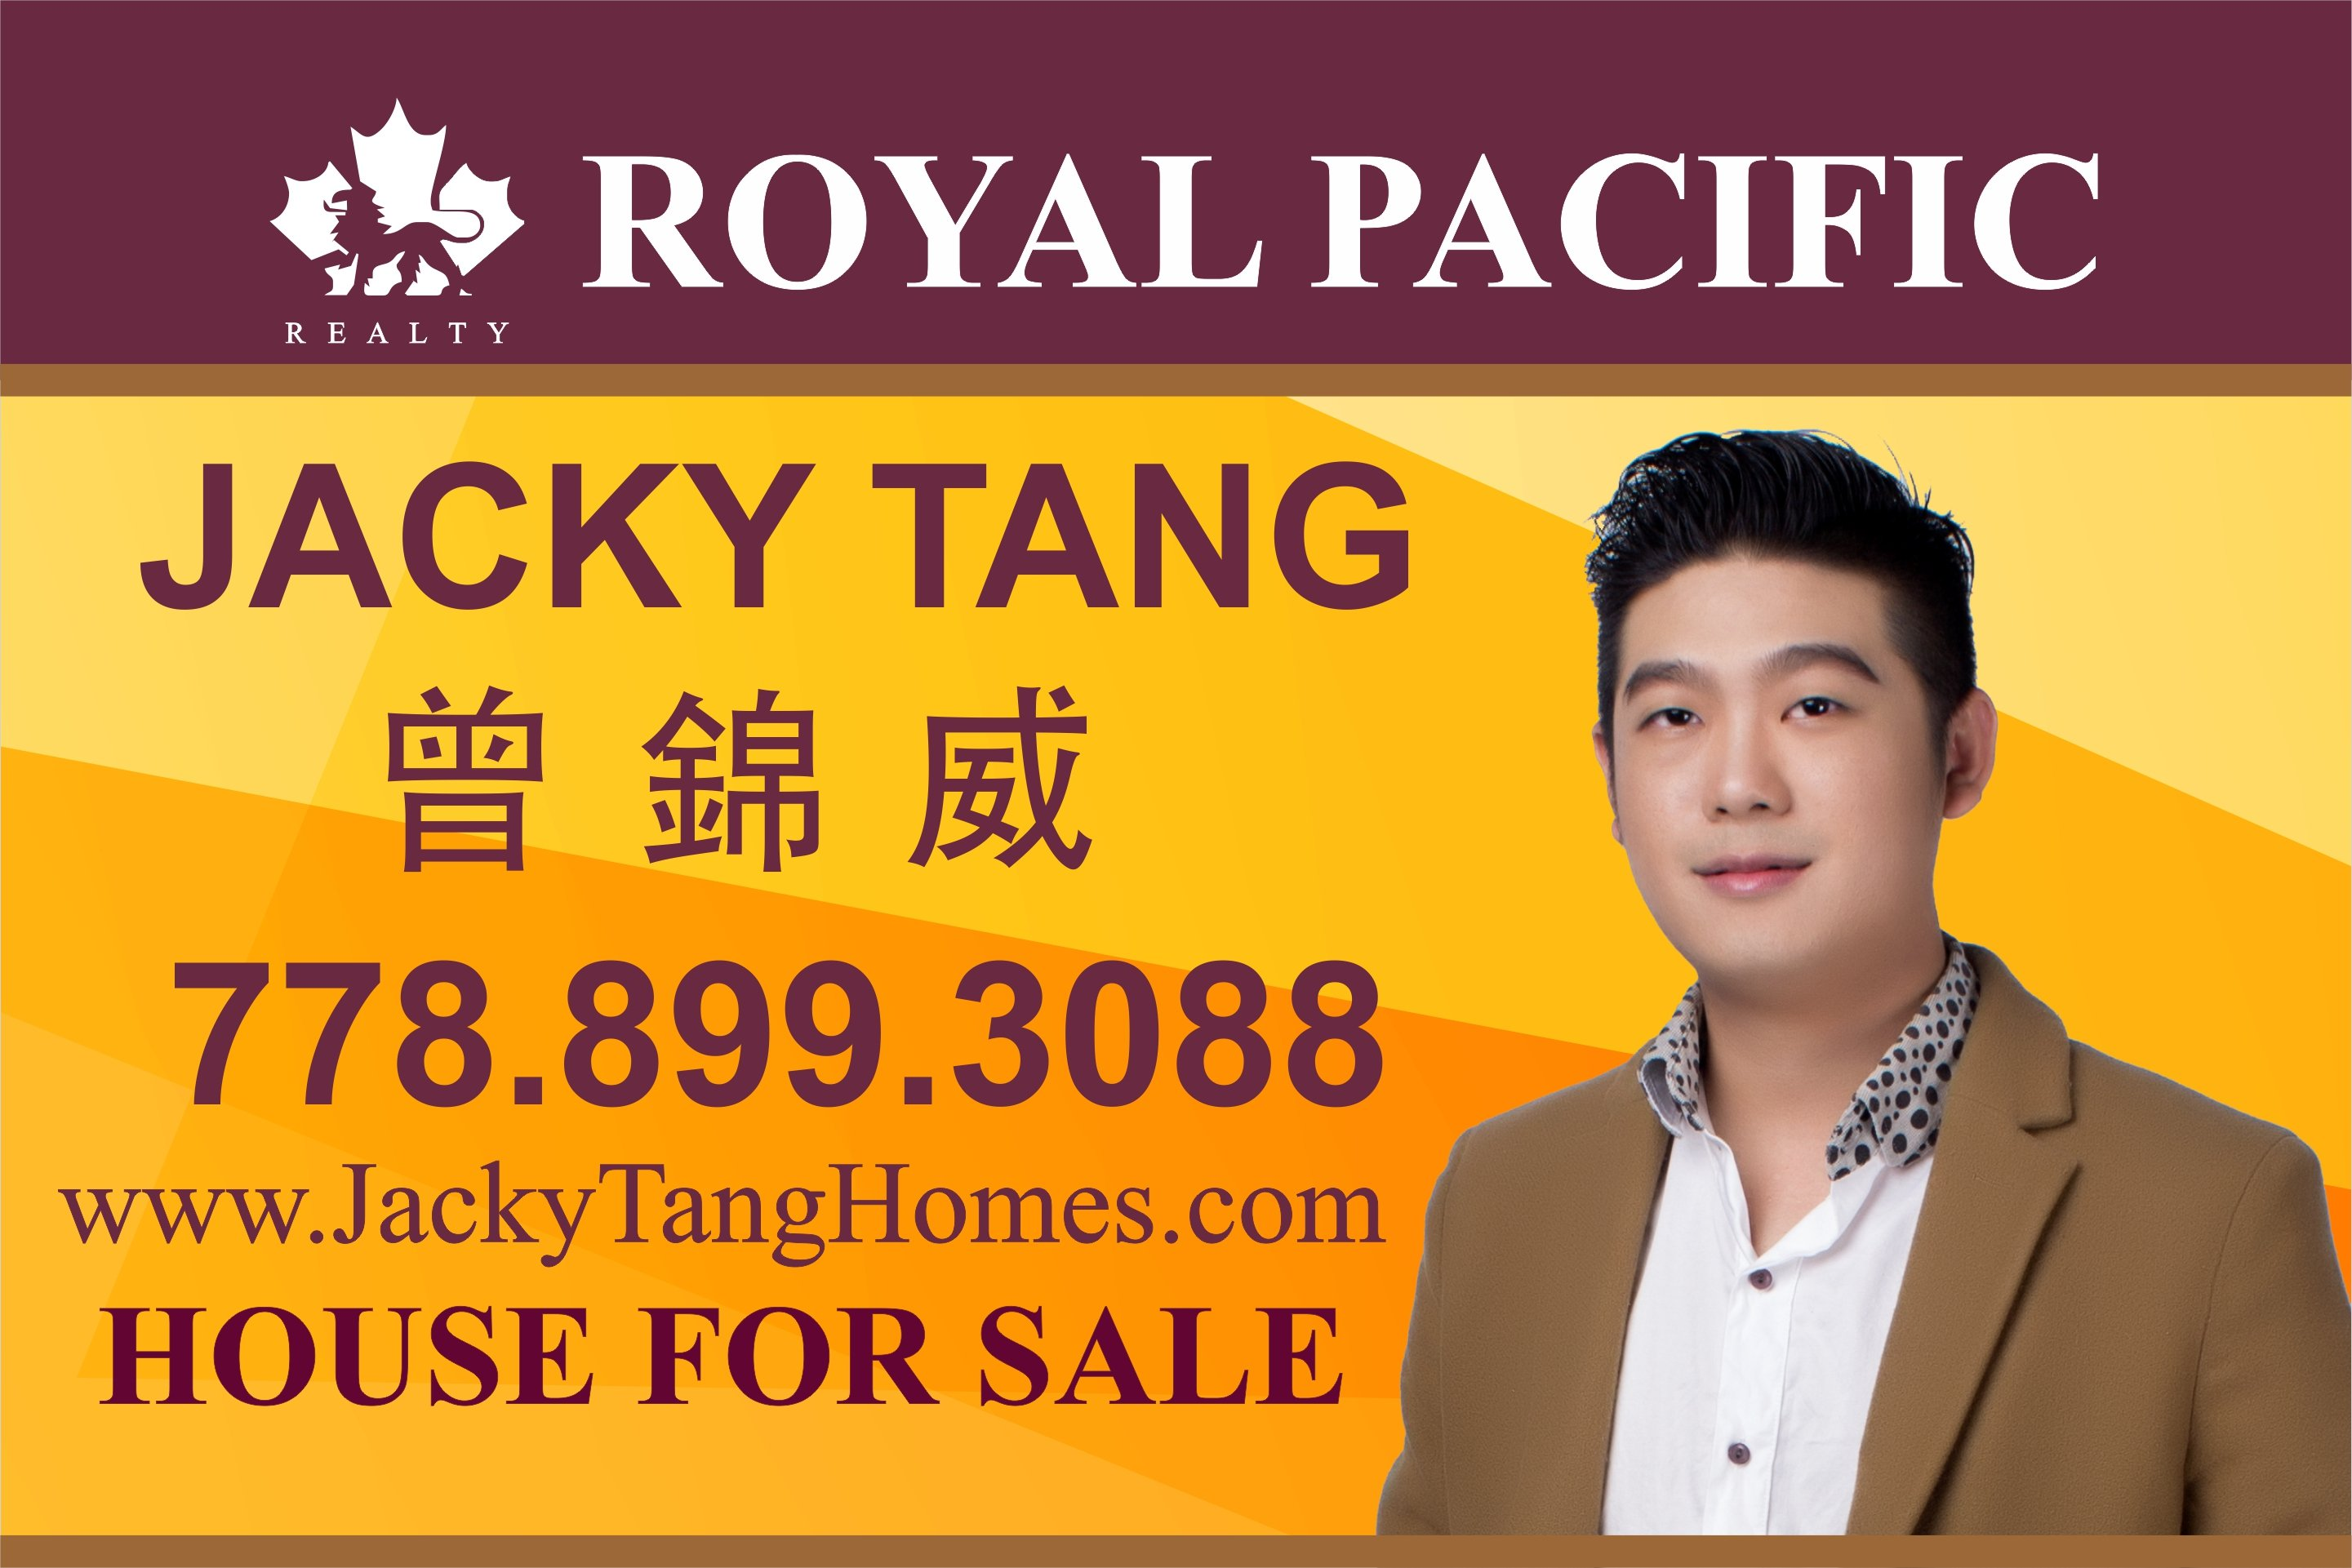 Jacky Tang